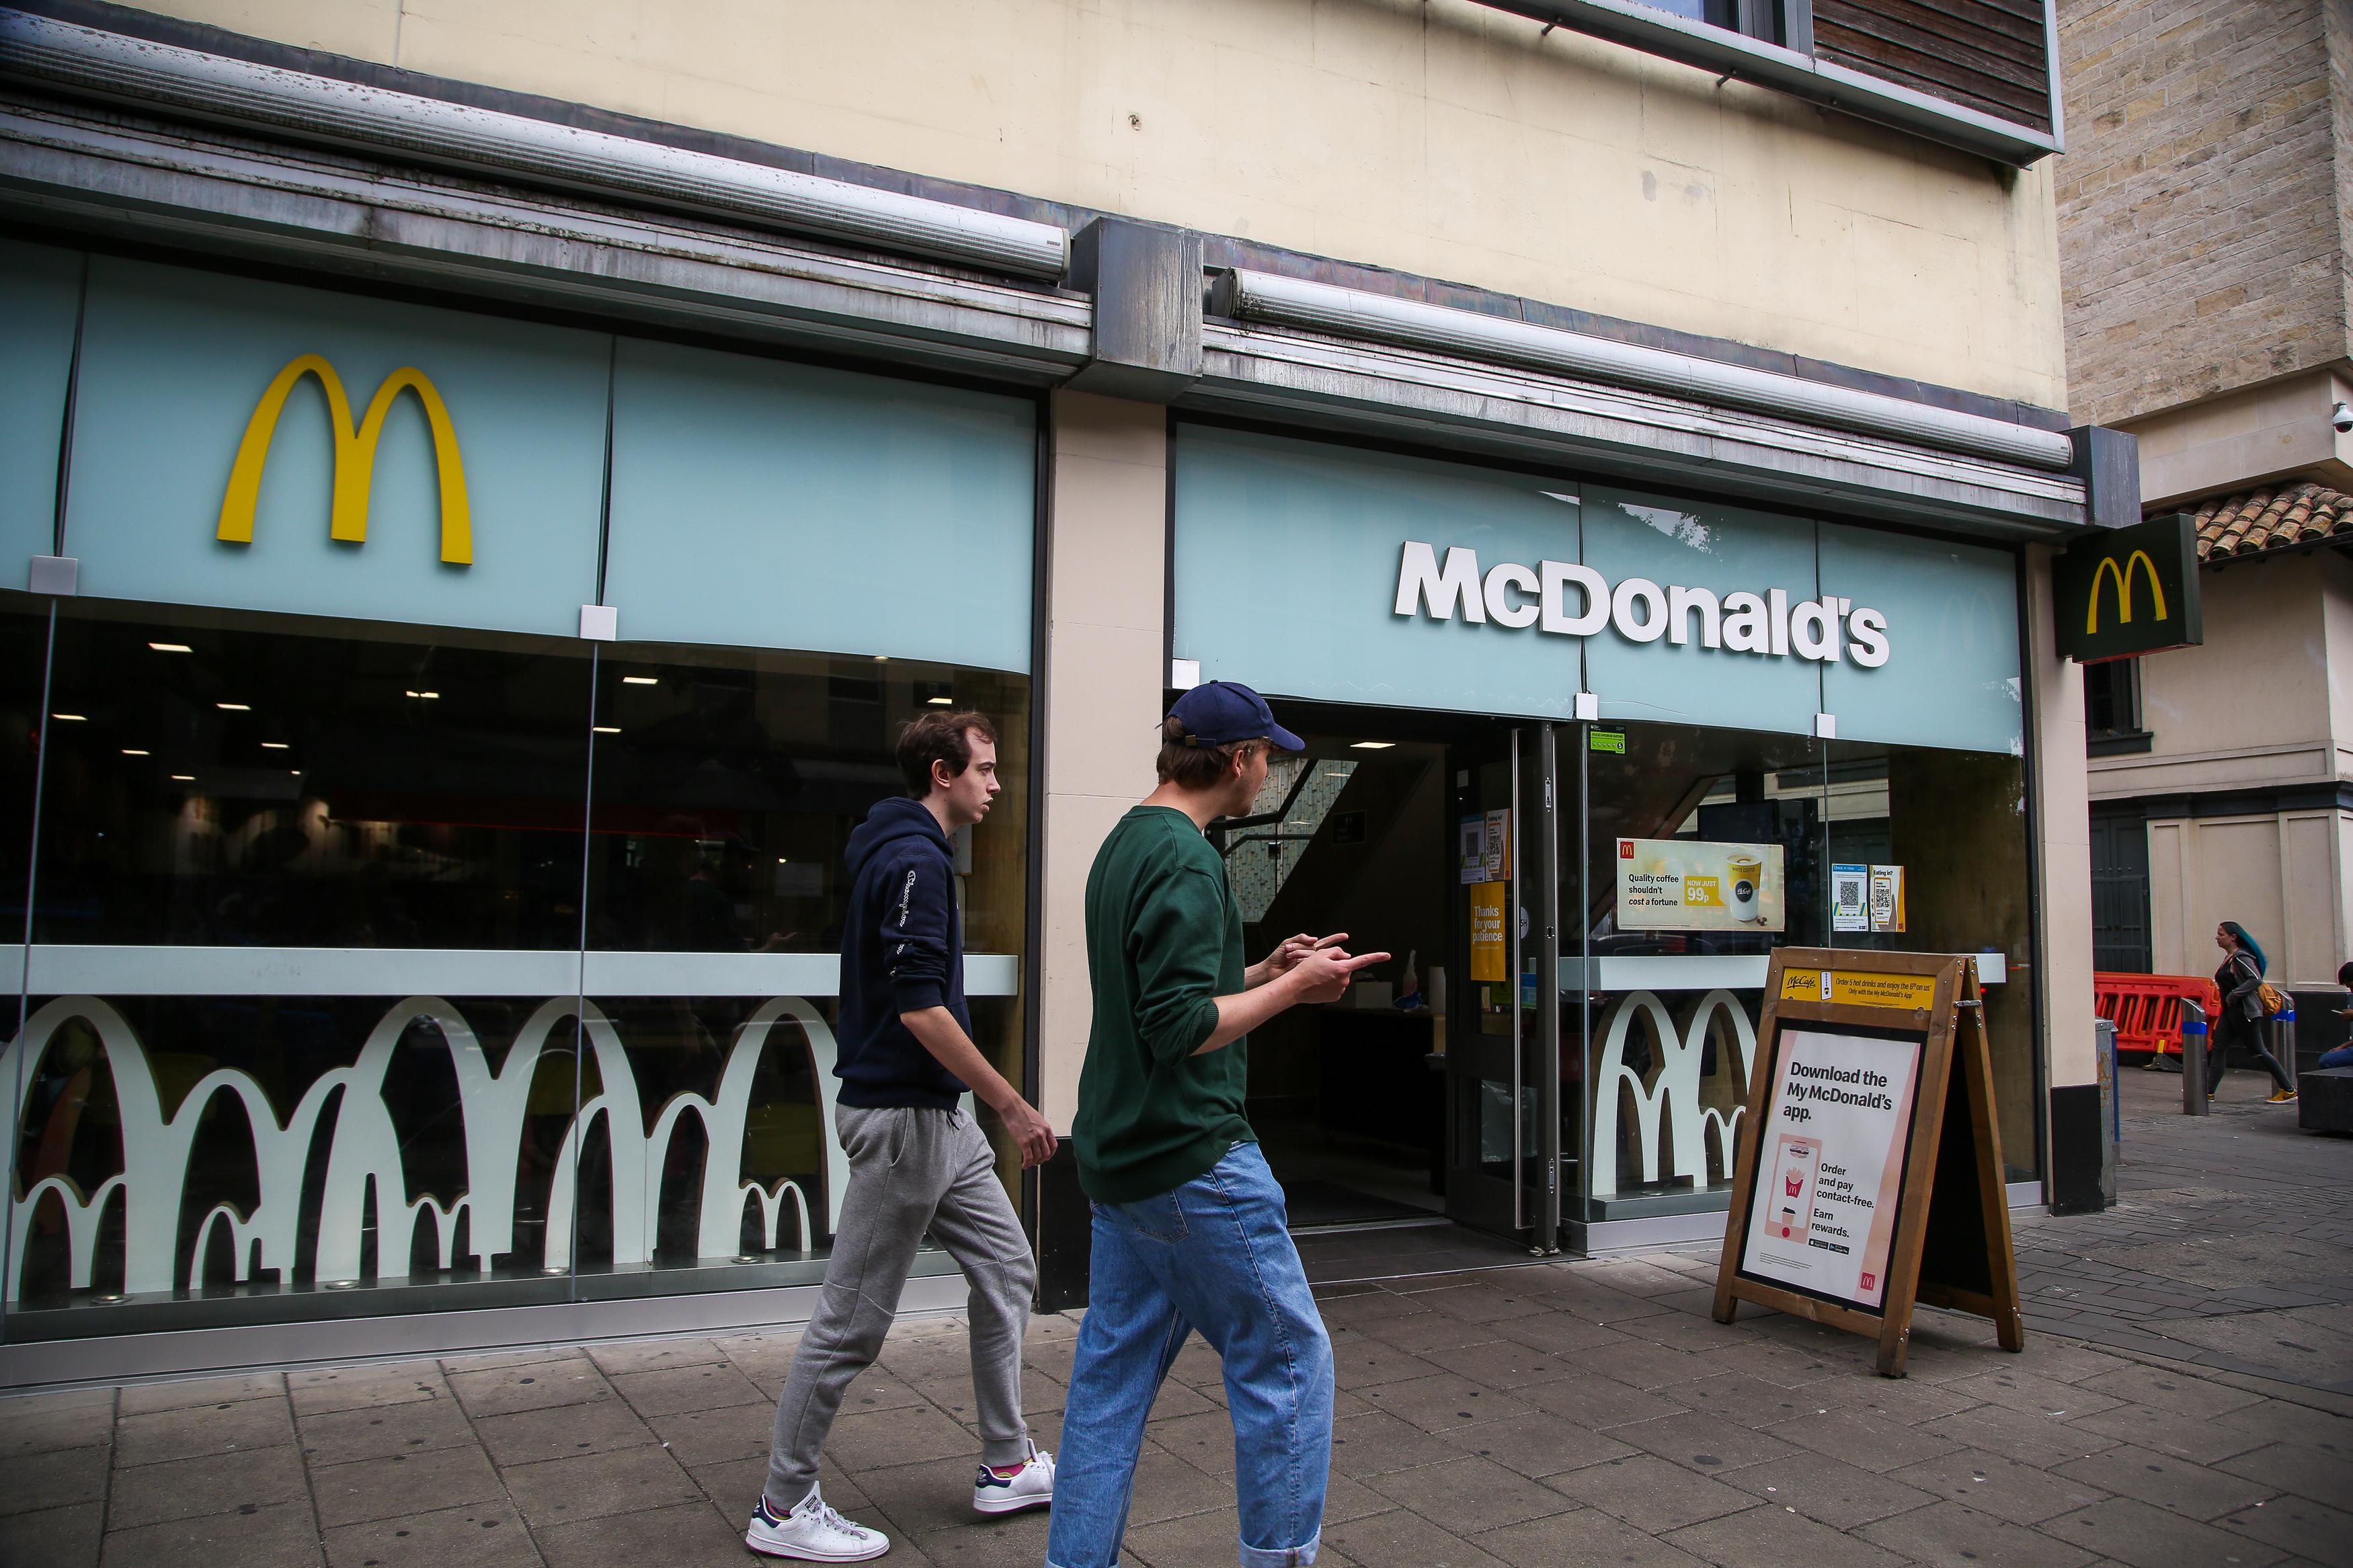 BRISTOL, UNITED KINGDOM - 2021/08/16: Men walk past a branch of McDonald's in Bristol. (Photo by Dinendra Haria/SOPA Images/LightRocket via Getty Images)